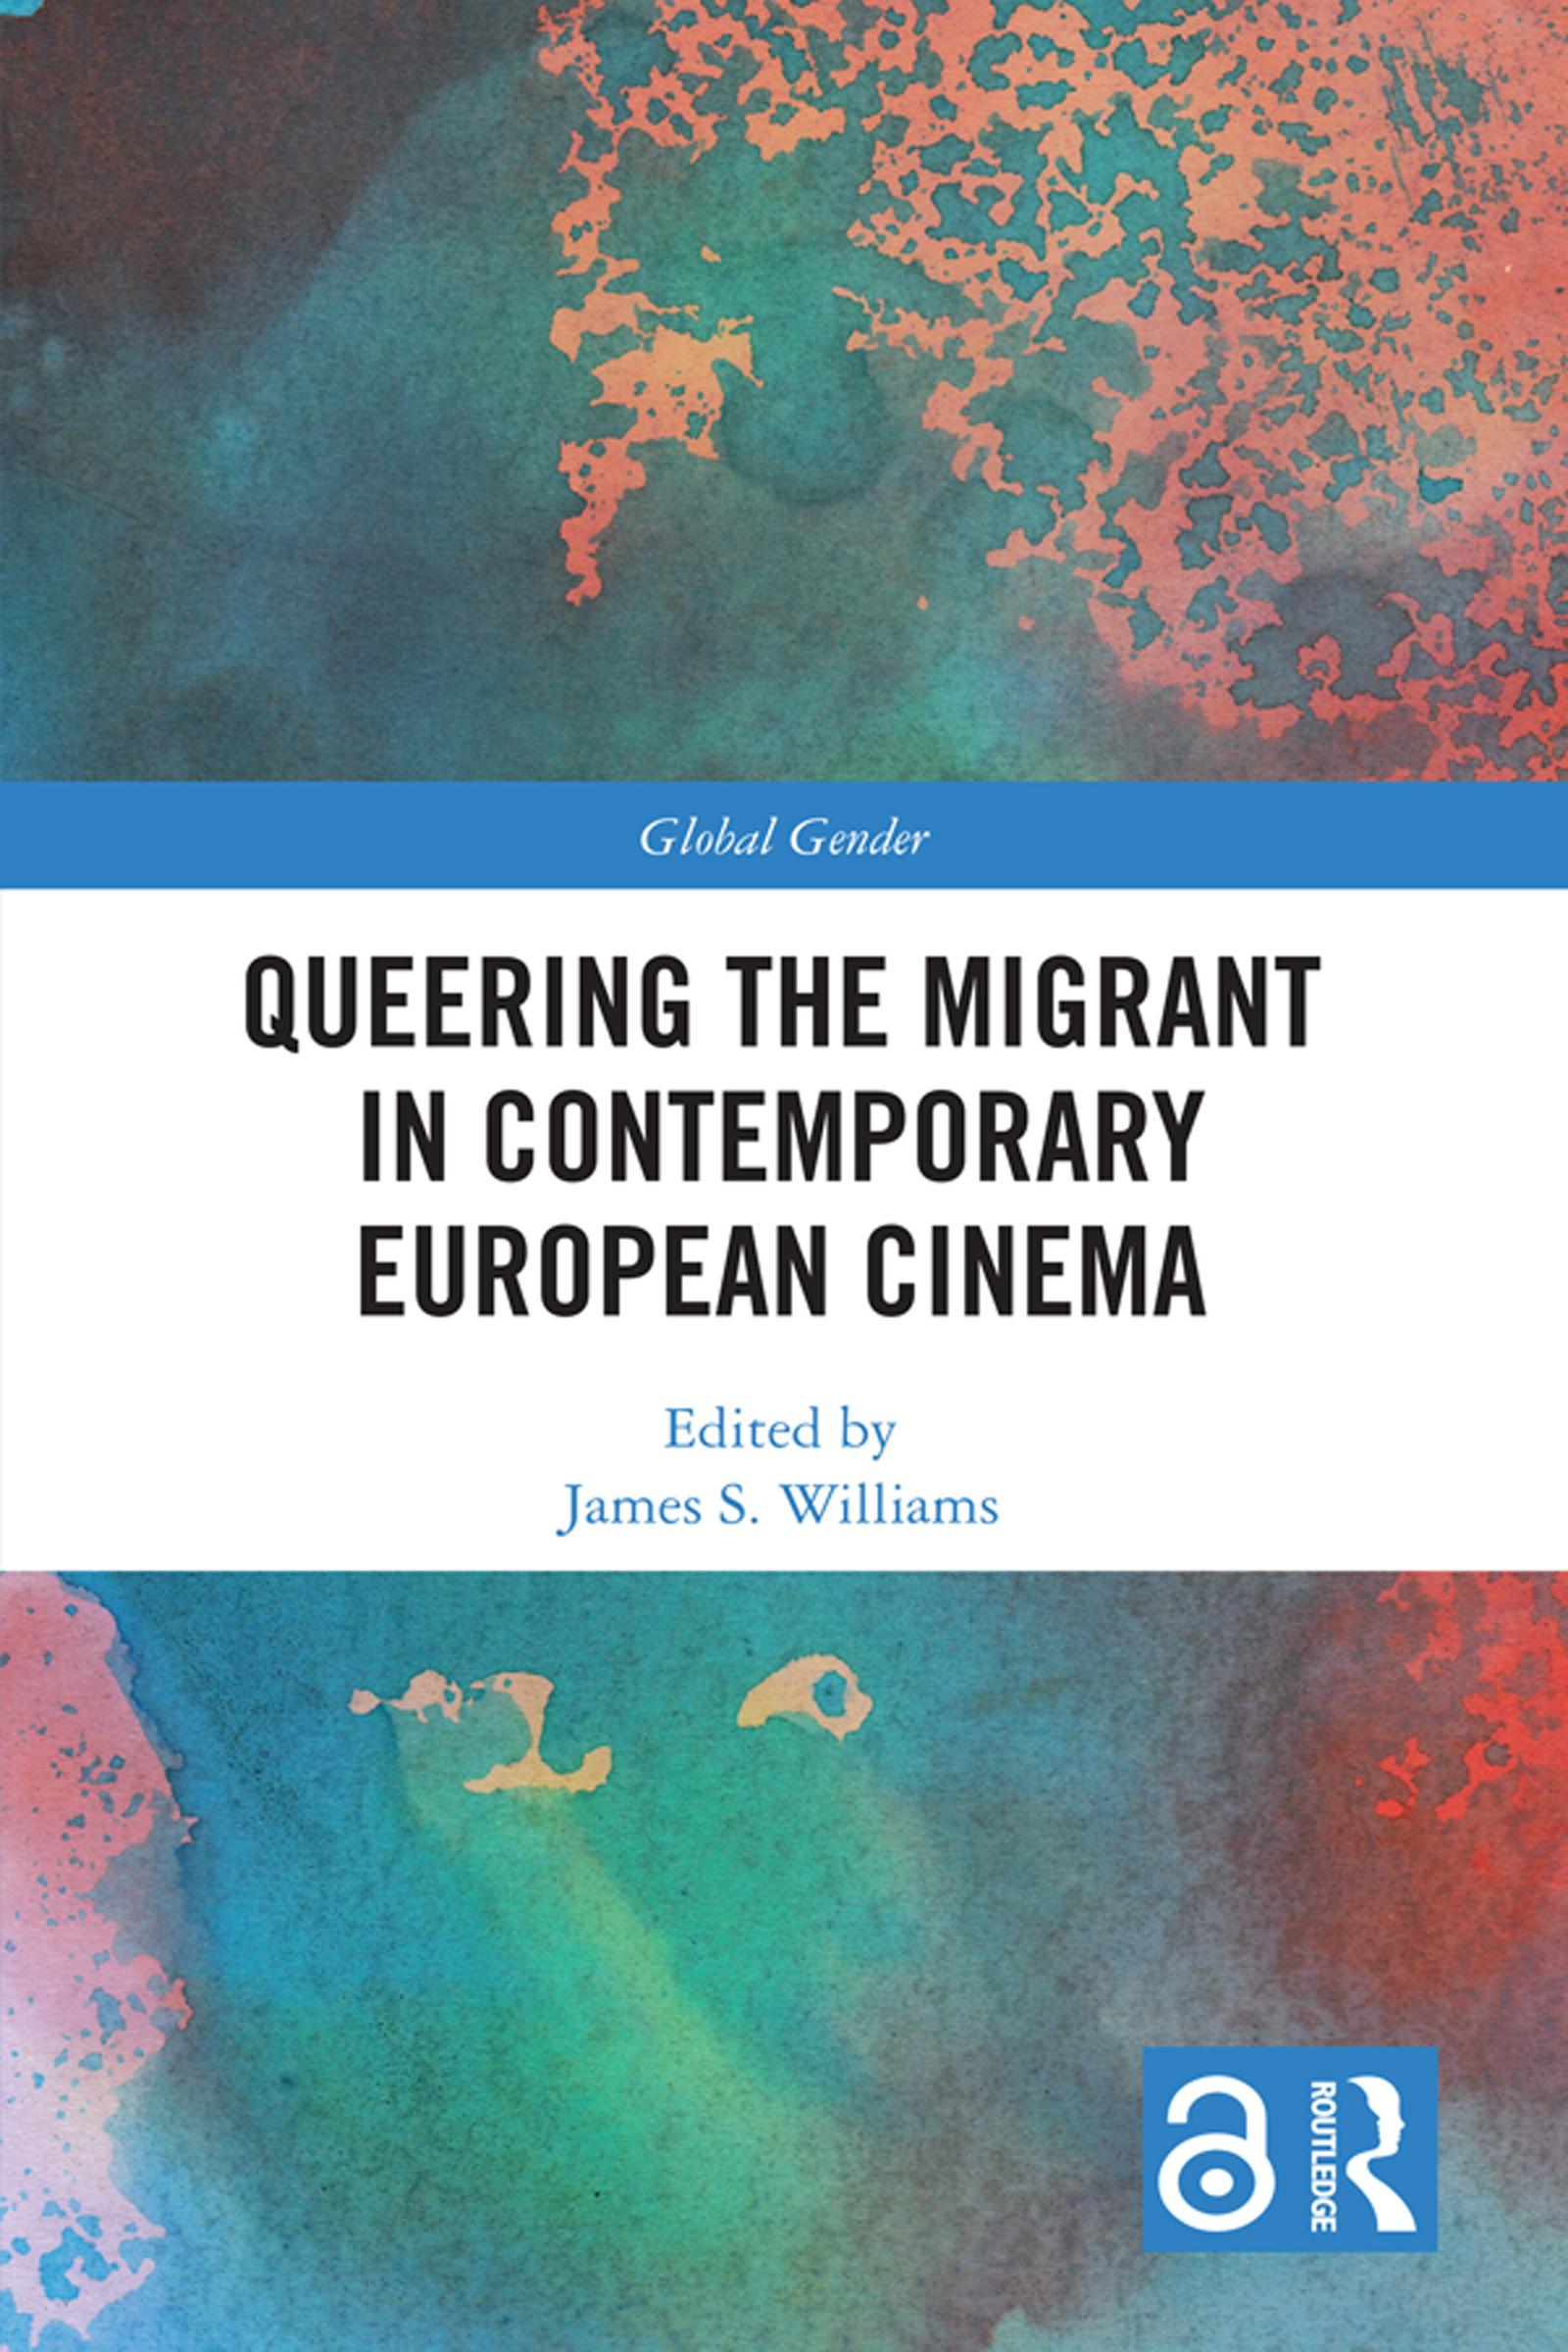 Queering the Migrant in Contemporary European Cinema